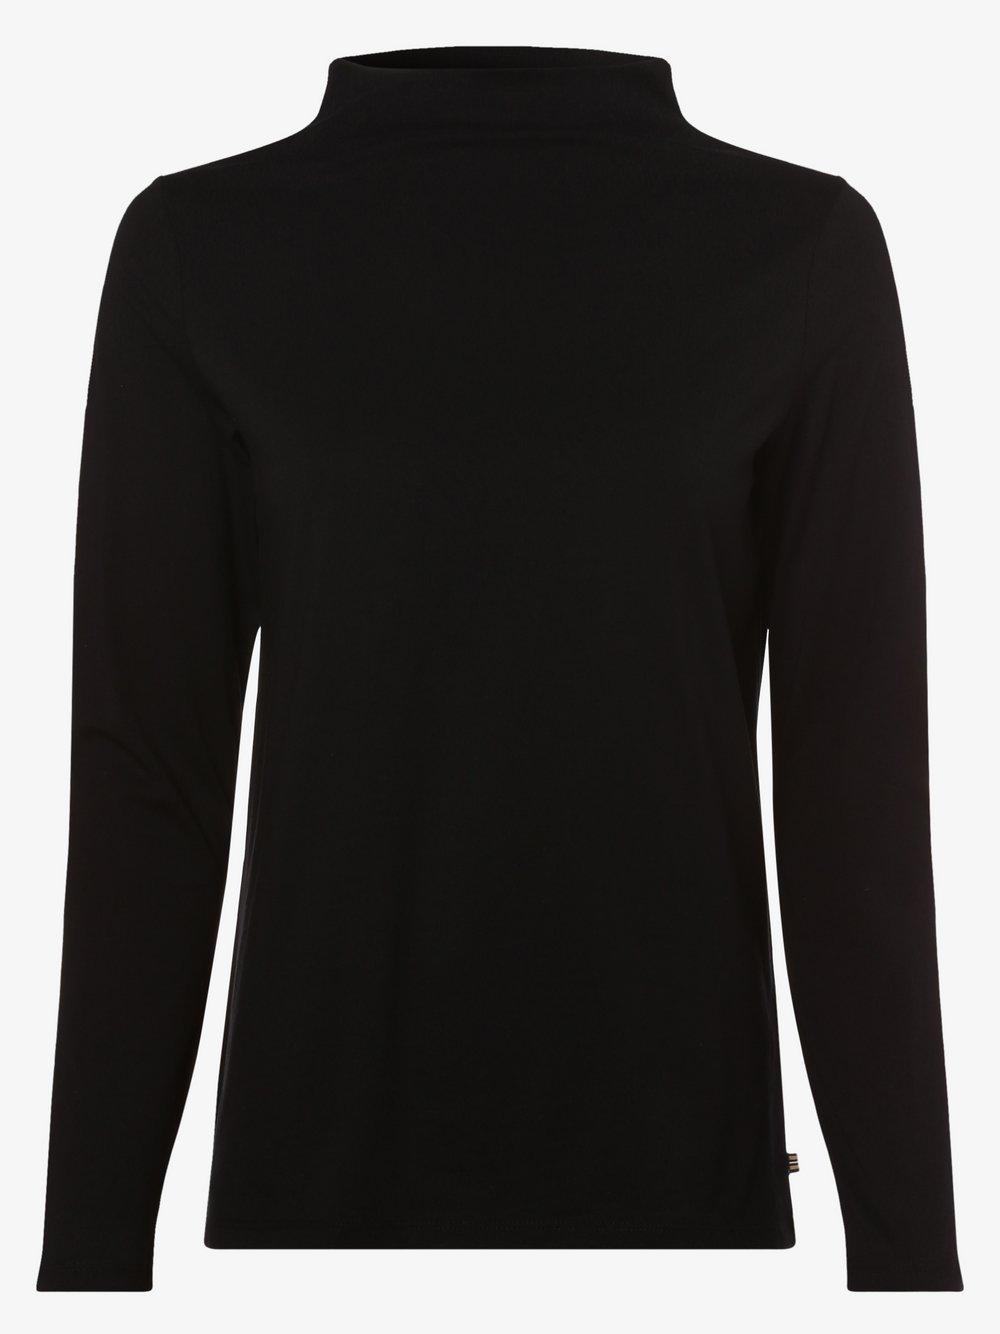 Esprit Casual – Damska koszulka z długim rękawem, czarny Van Graaf 460530-0001-09920